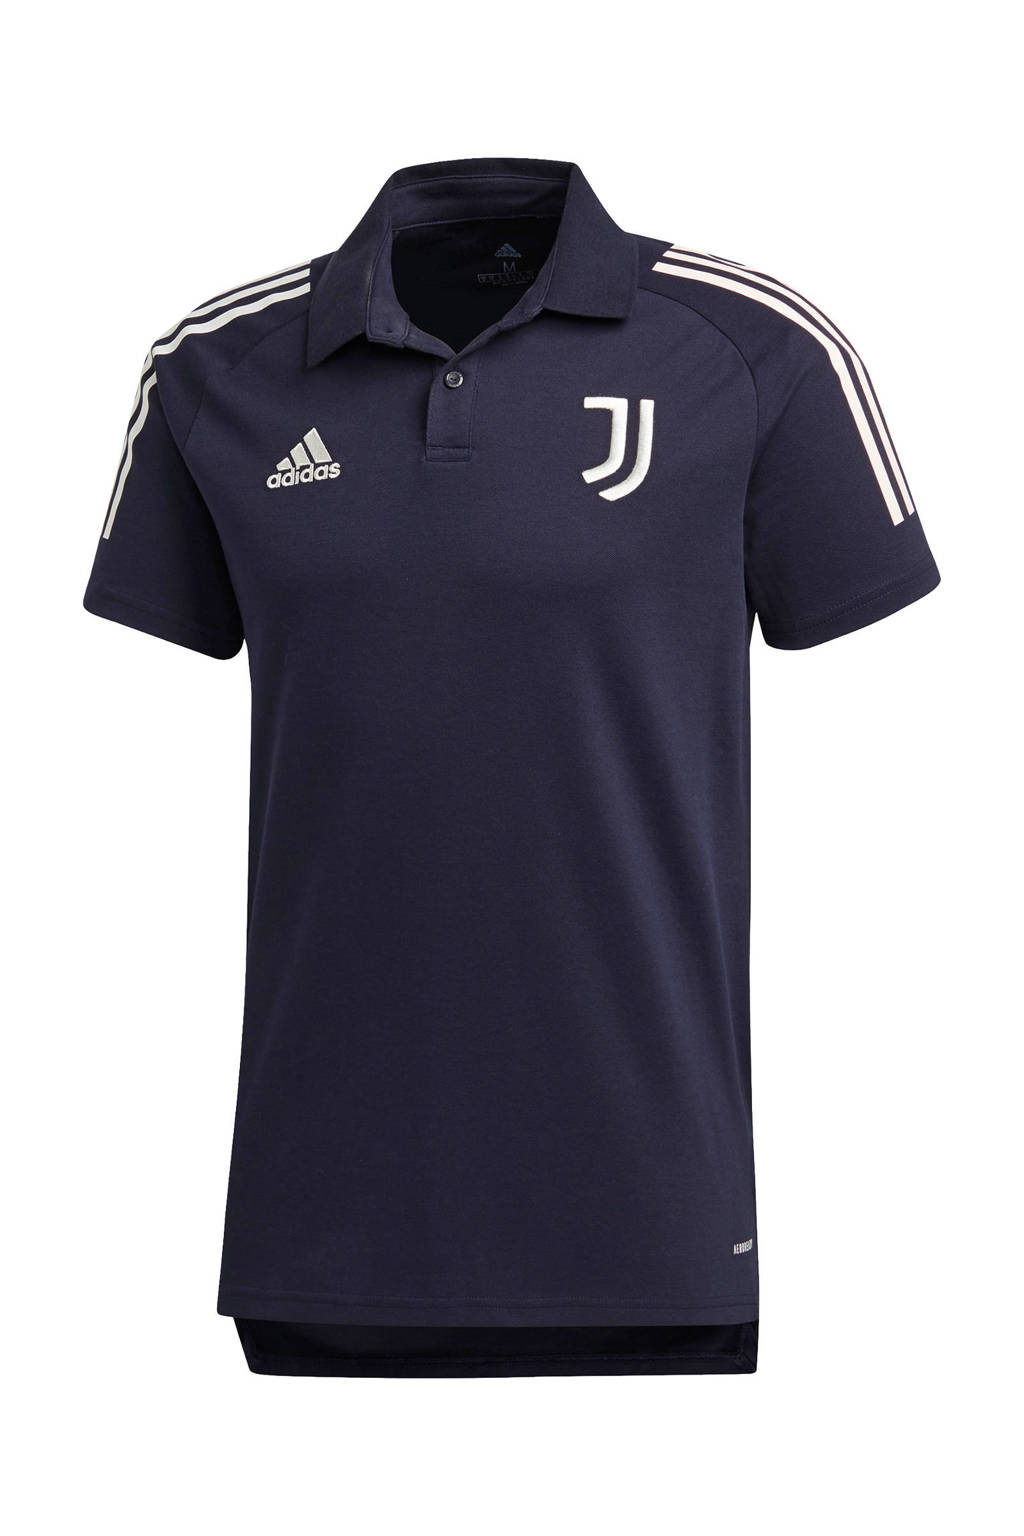 adidas Performance Senior Juventus polo donkerblauw, Donkerblauw